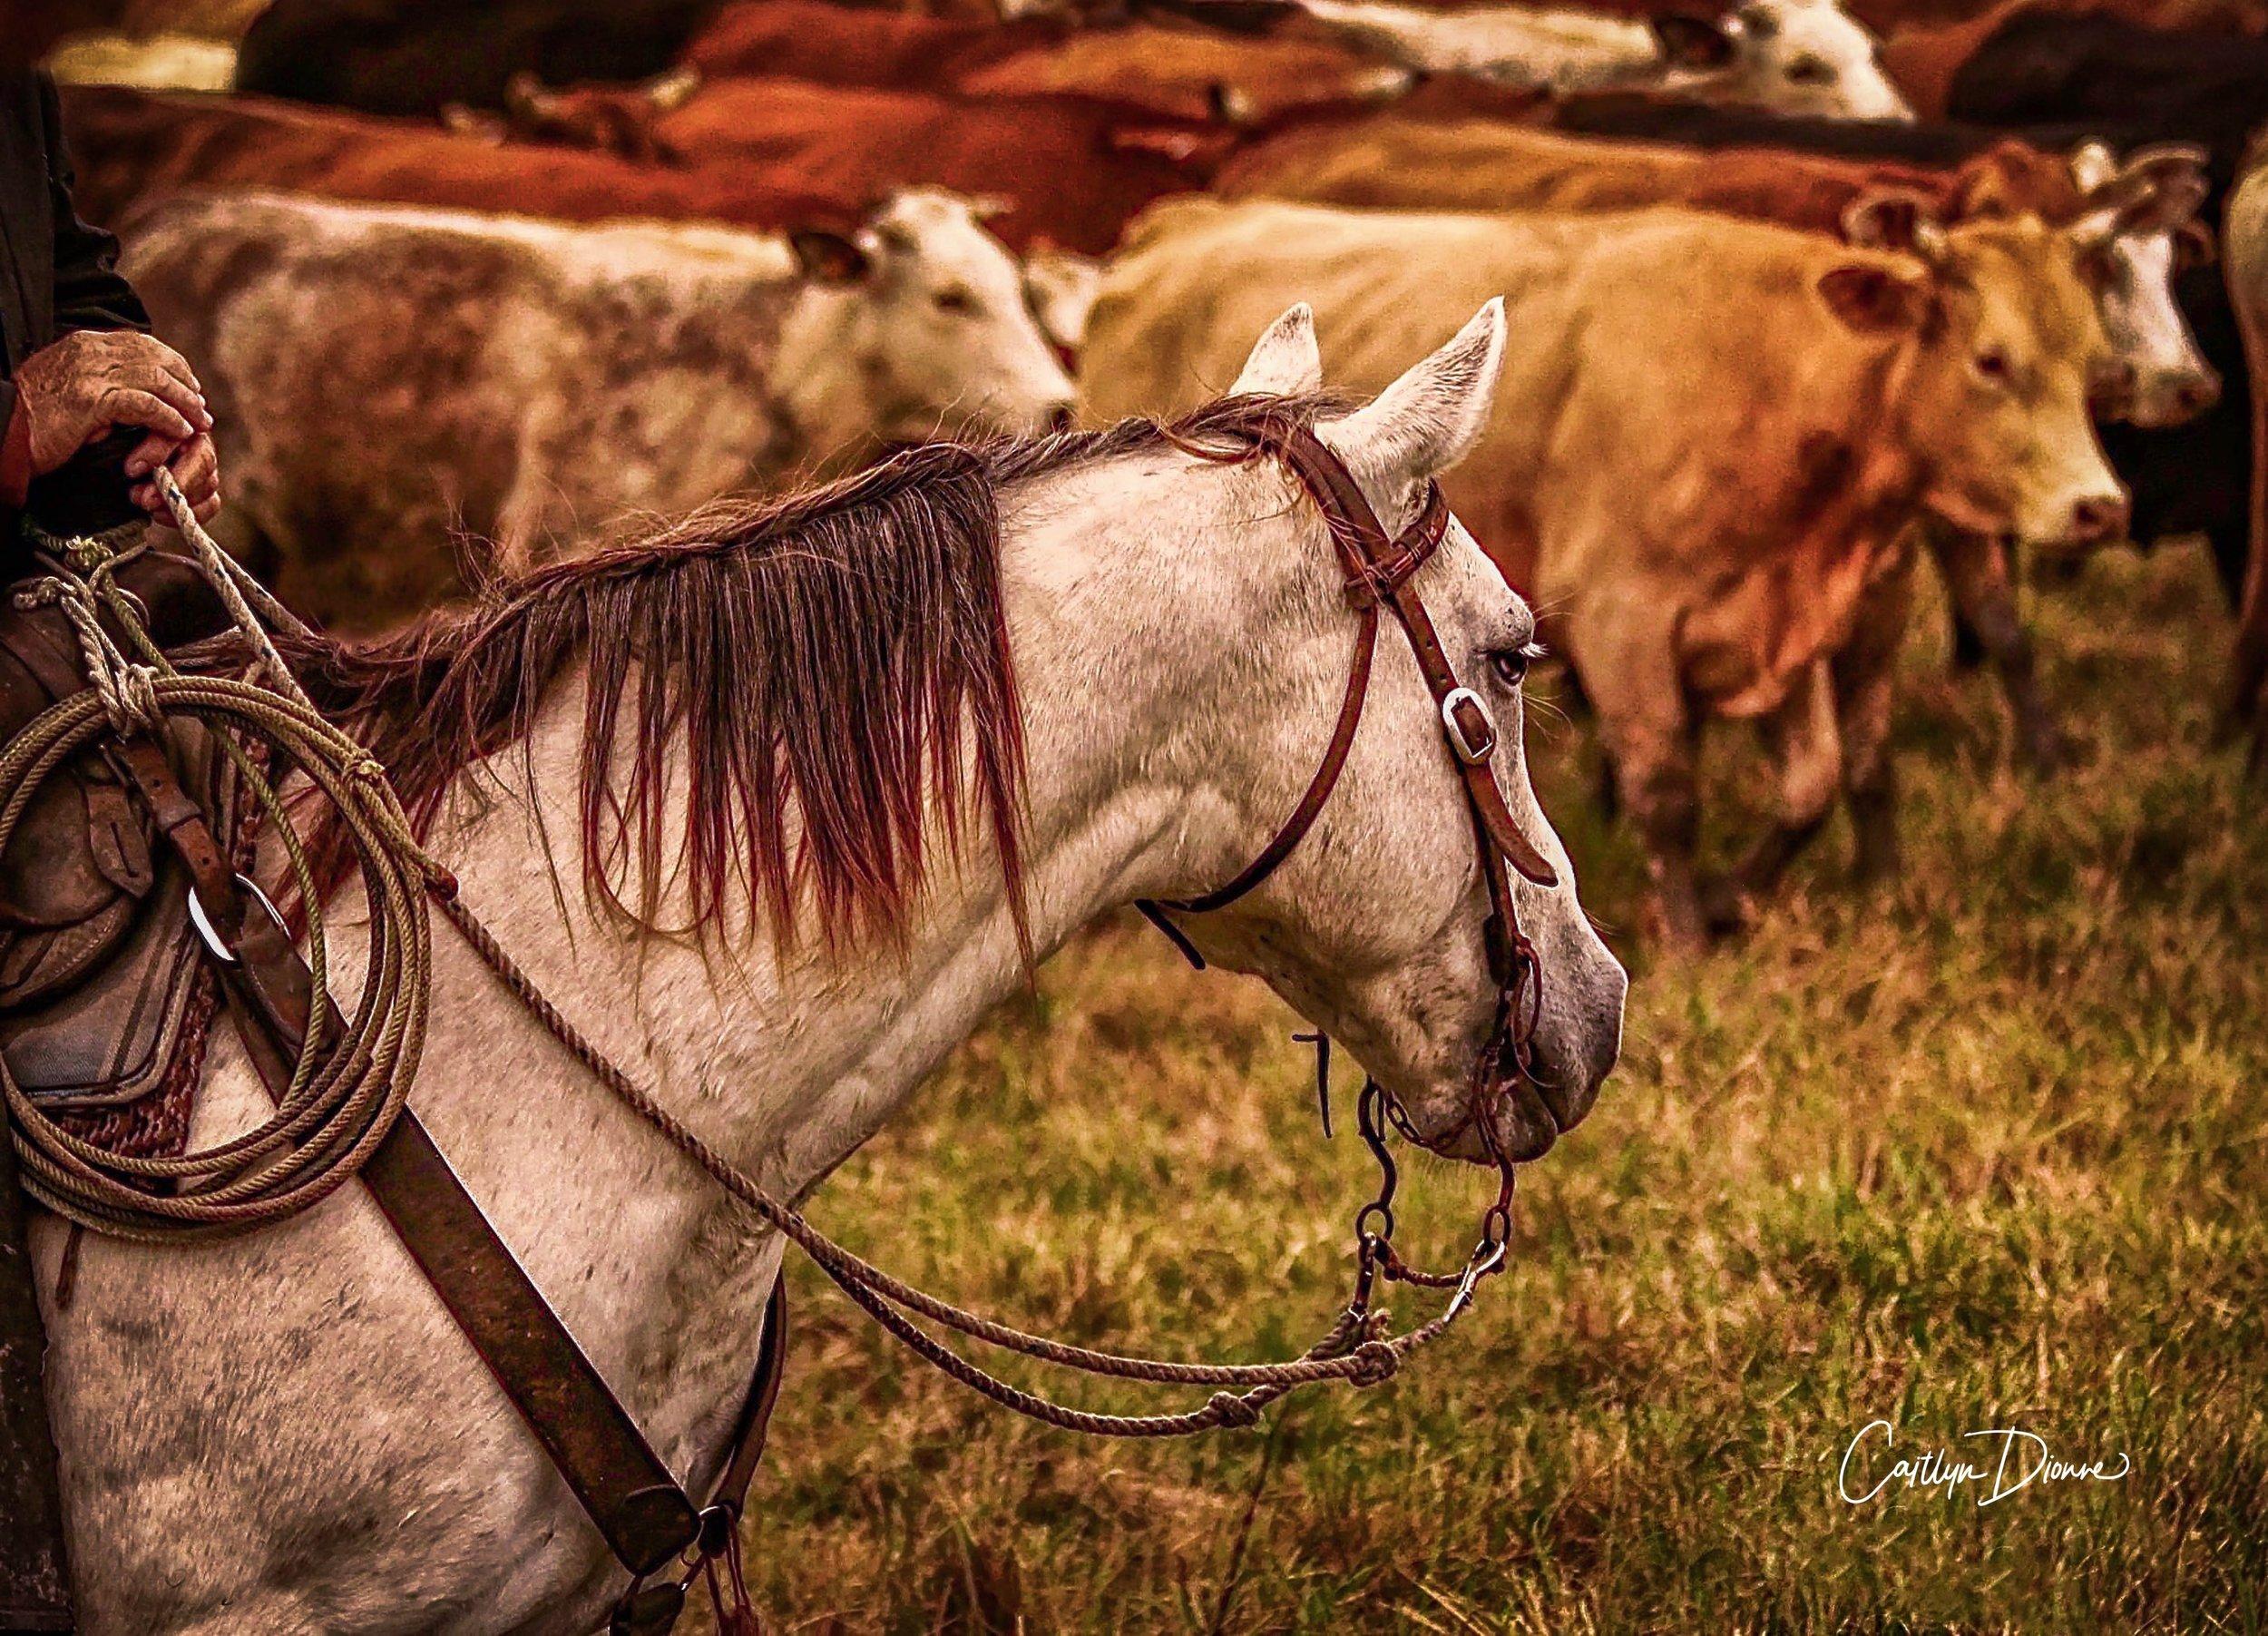 Cow Horse Reminiscing.7.2018.jpg